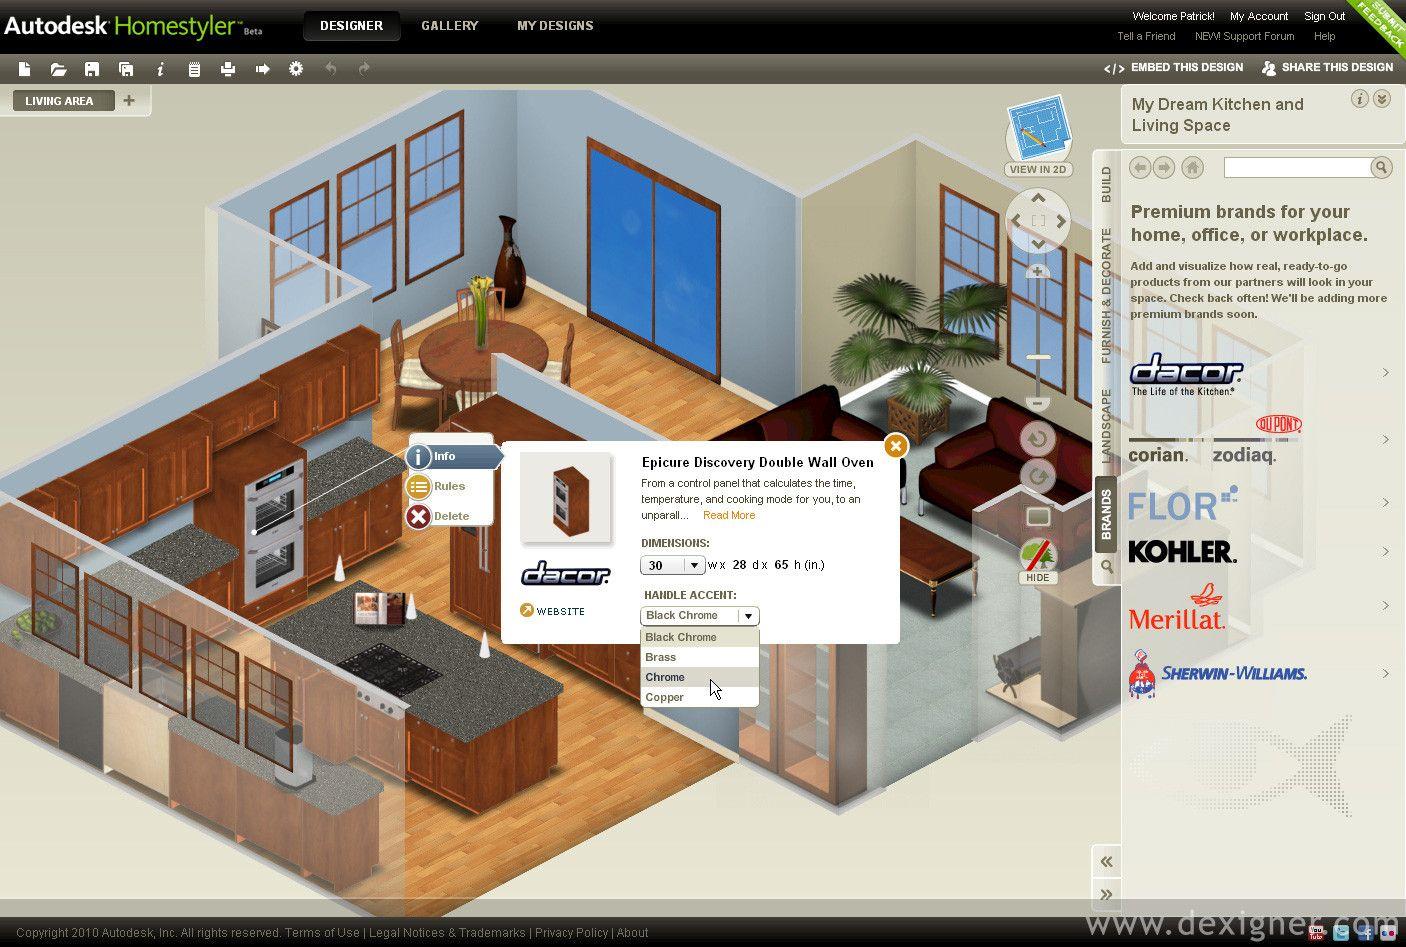 Top 15 Virtual Room Software Tools And Programs Pouted Com Home Design Software Interior Design Software Home Design Software Free